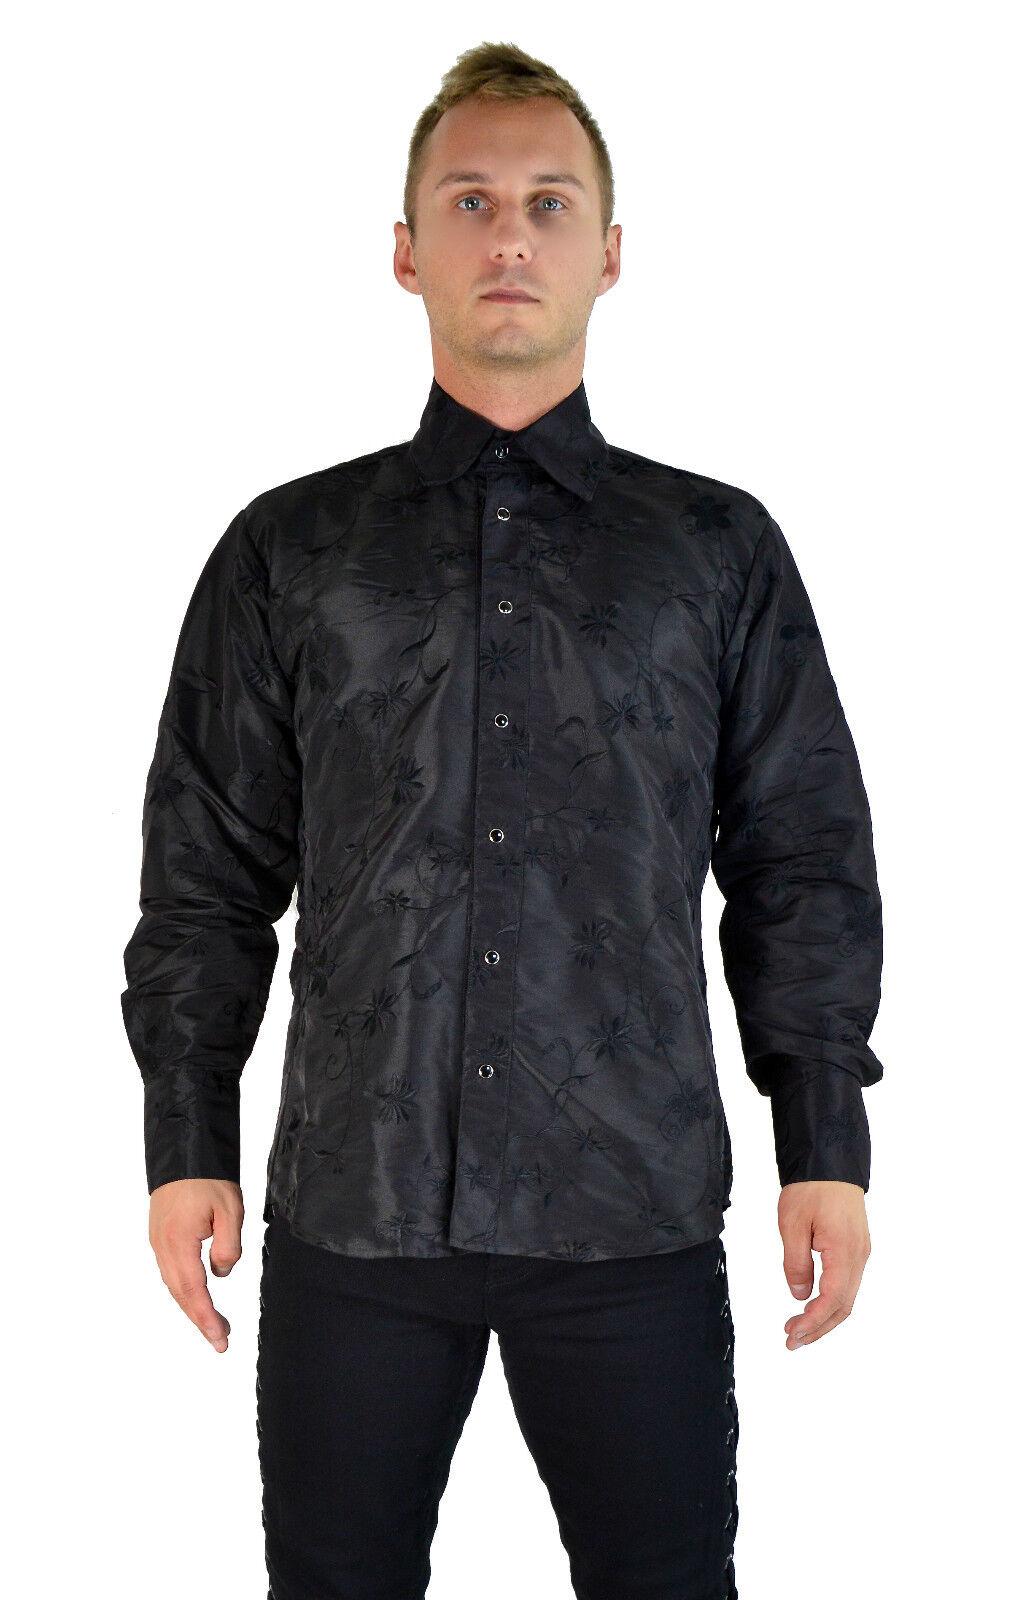 SHRINE ARISTOCRAT GOTHIC STEAMPUNK PIRATE VICTORIAN BLACK ORCHID DRESS SHIRT Casual Button-Down Shirts